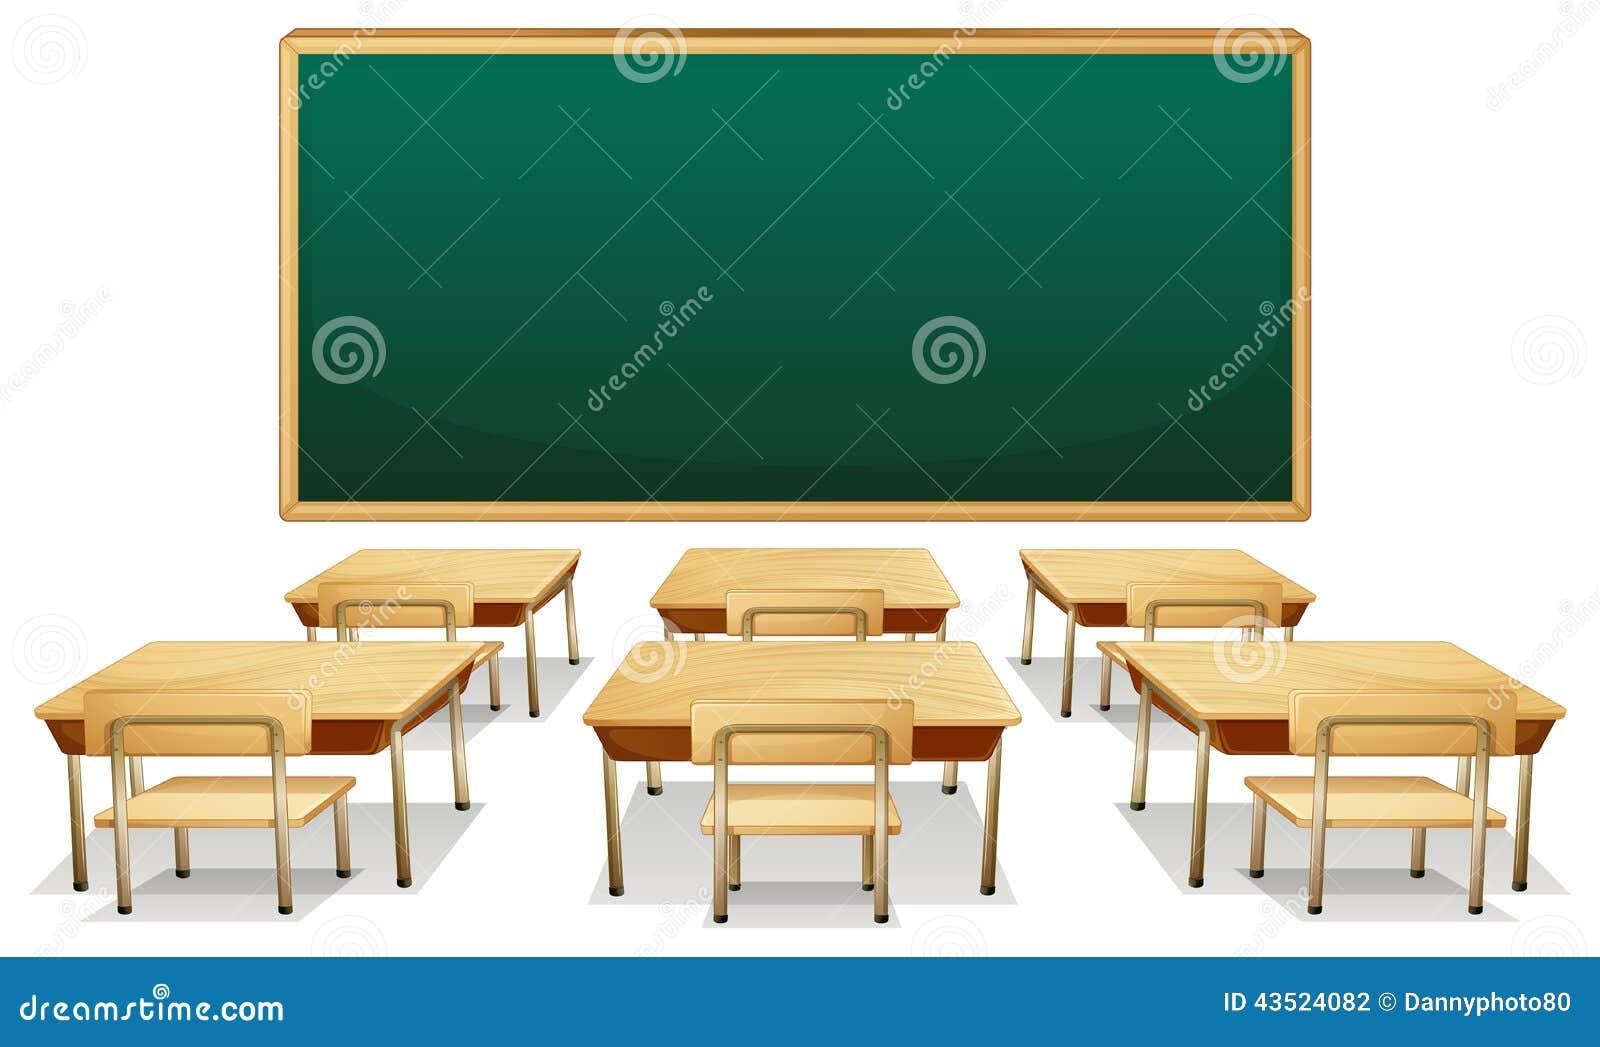 Classroom Stock Vector Image 43524082